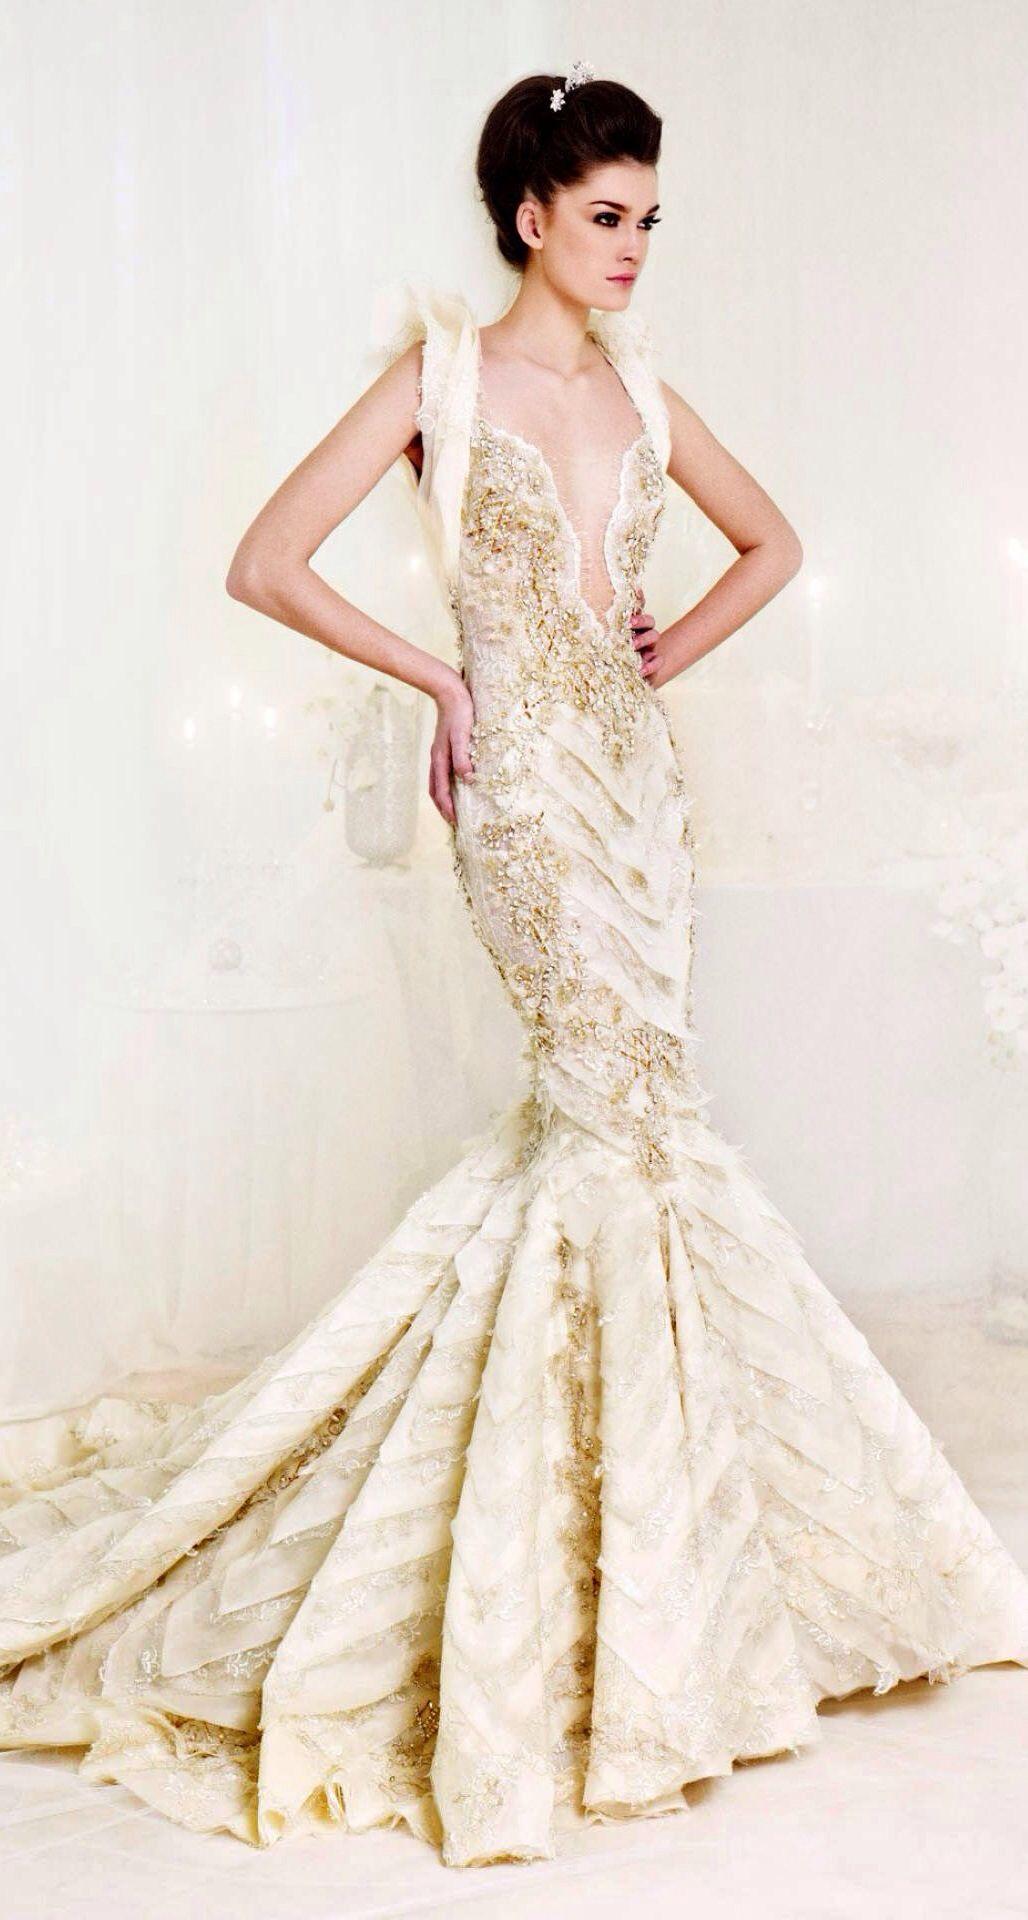 Nice wedding dresses  Really nice wedding dress idea for that special dayweddingday